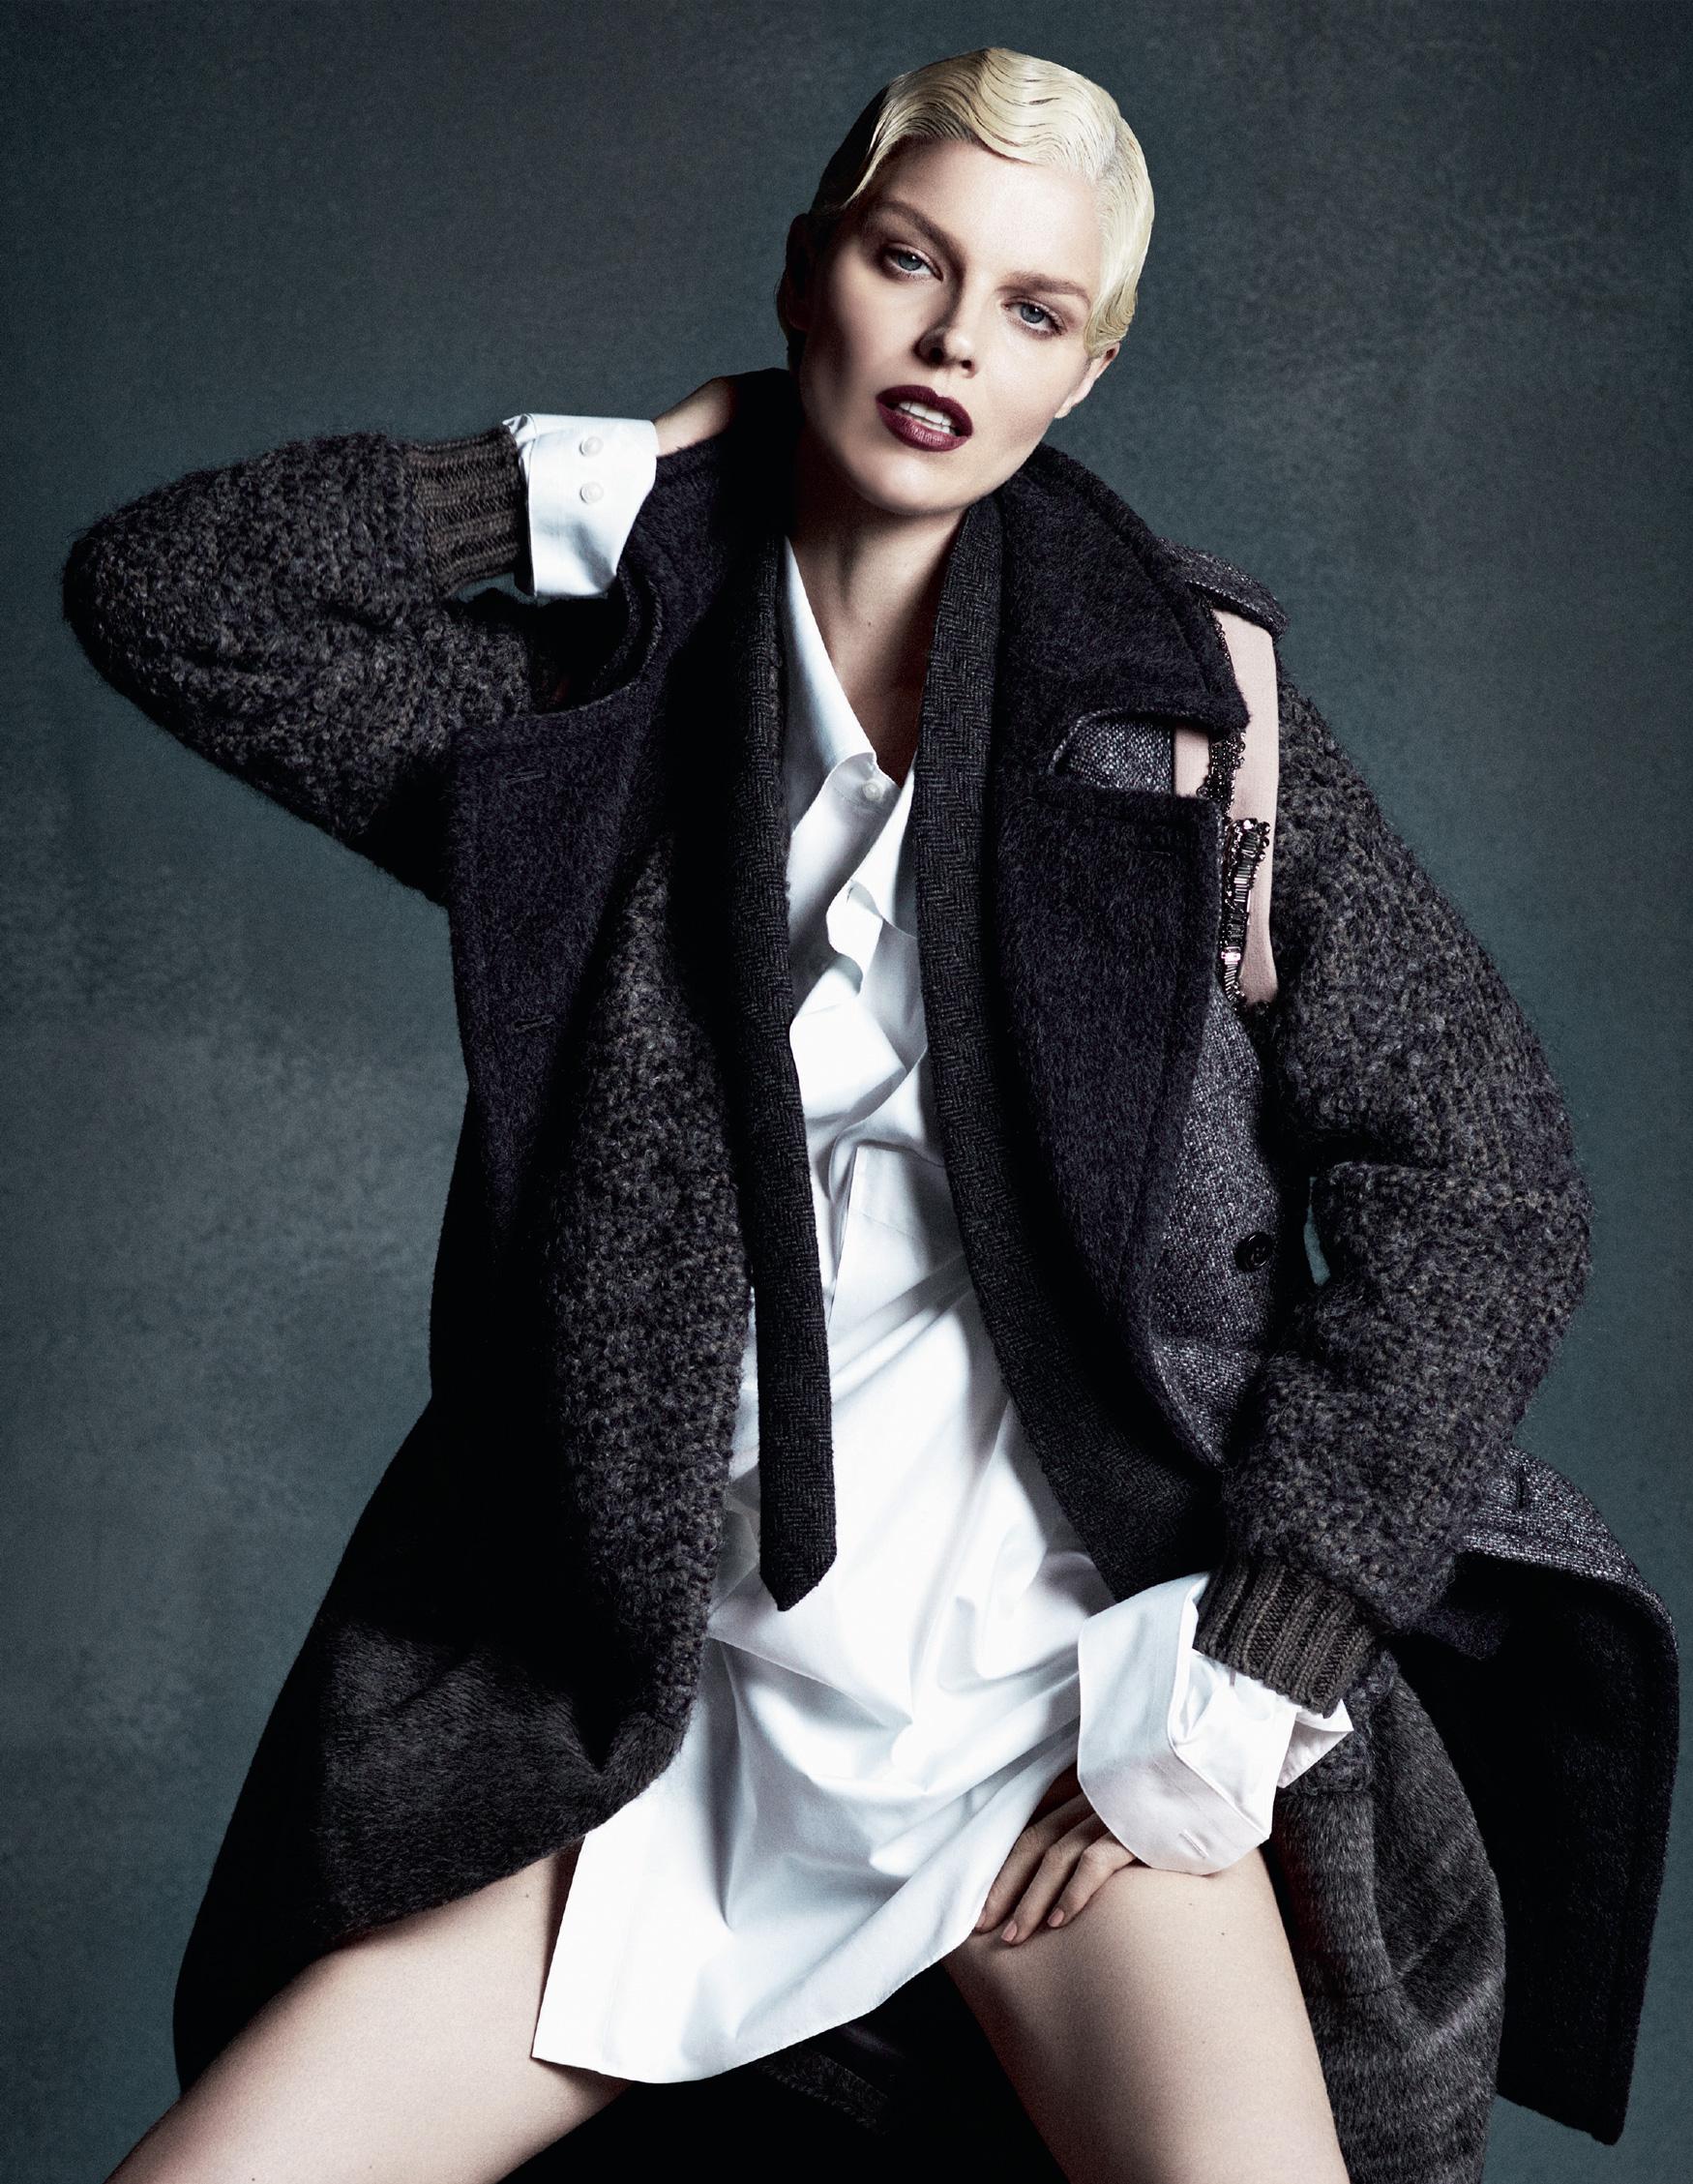 Giovanna-Battaglia-The-Icons-Of-Perfections-Vogue-Japan-15th-Anniversary-Issue-Luigi-Iango-V181_242_200-25.jpg